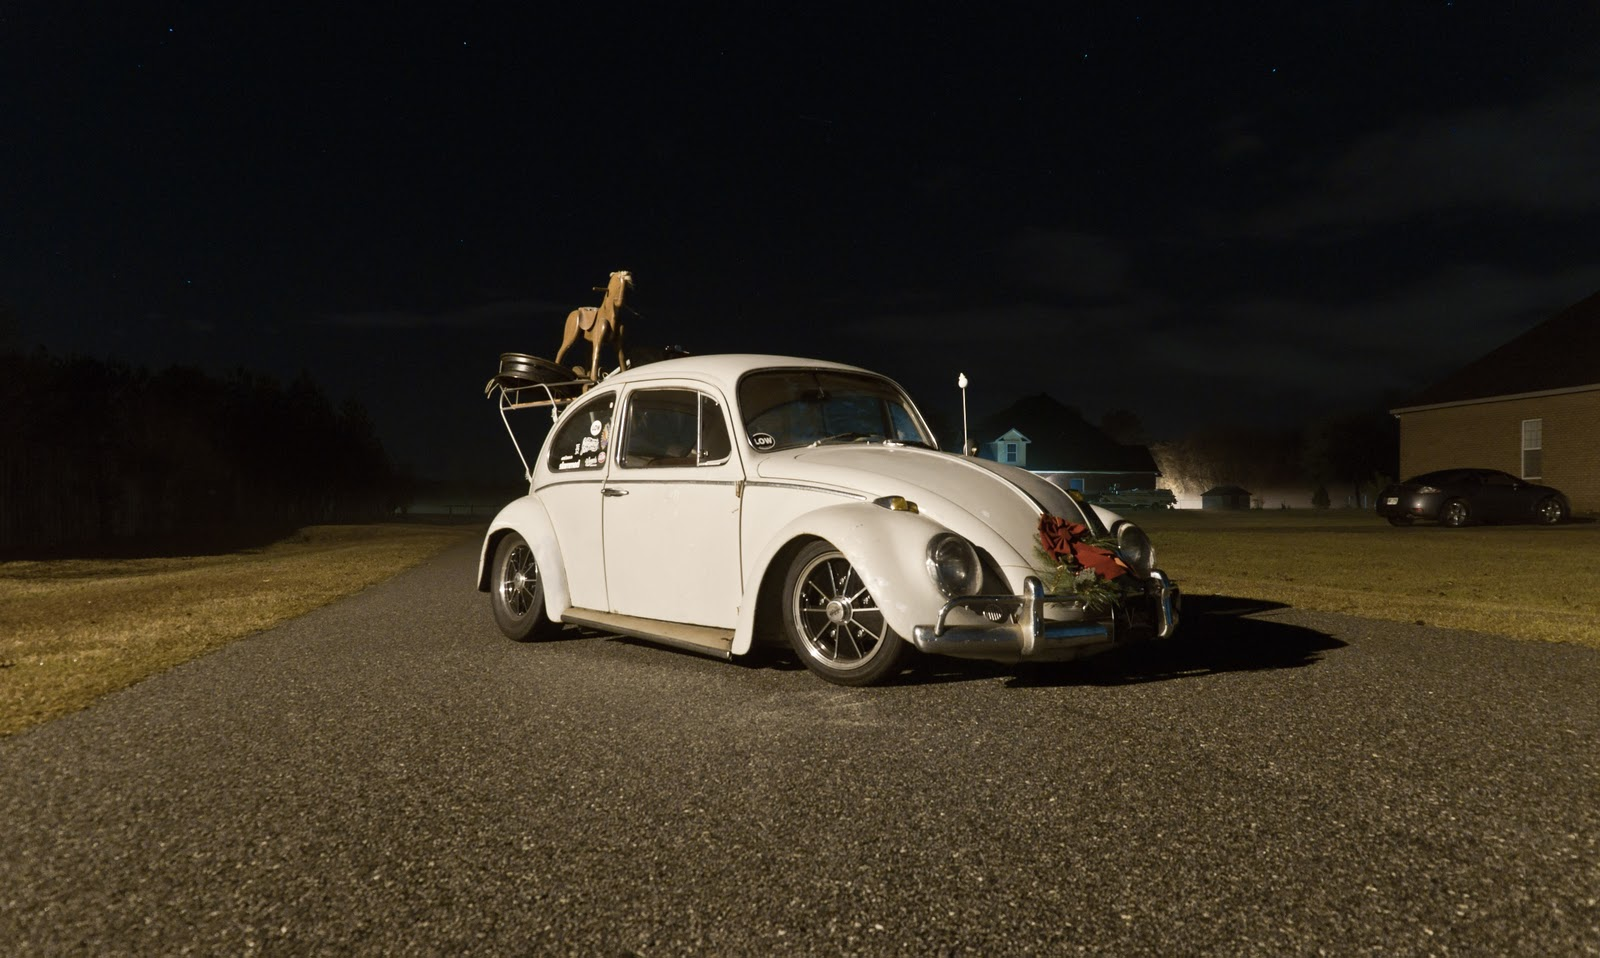 Otis - my '65 Beetle DSC_0004-3